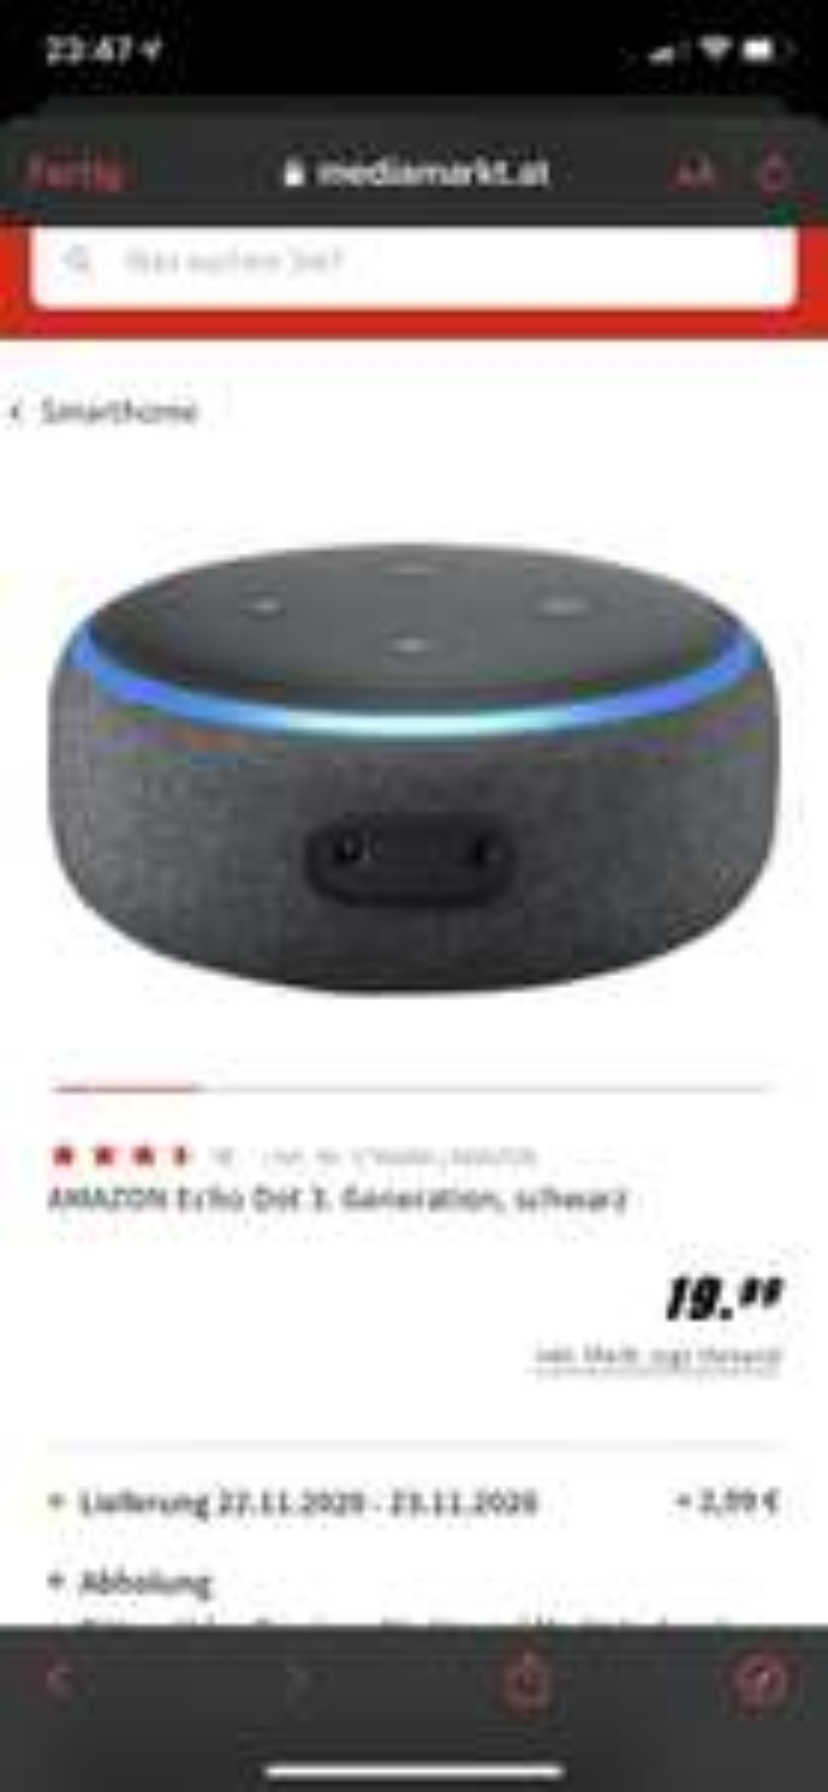 (Mediamarkt) Amazon Echo Dot 3. Generation